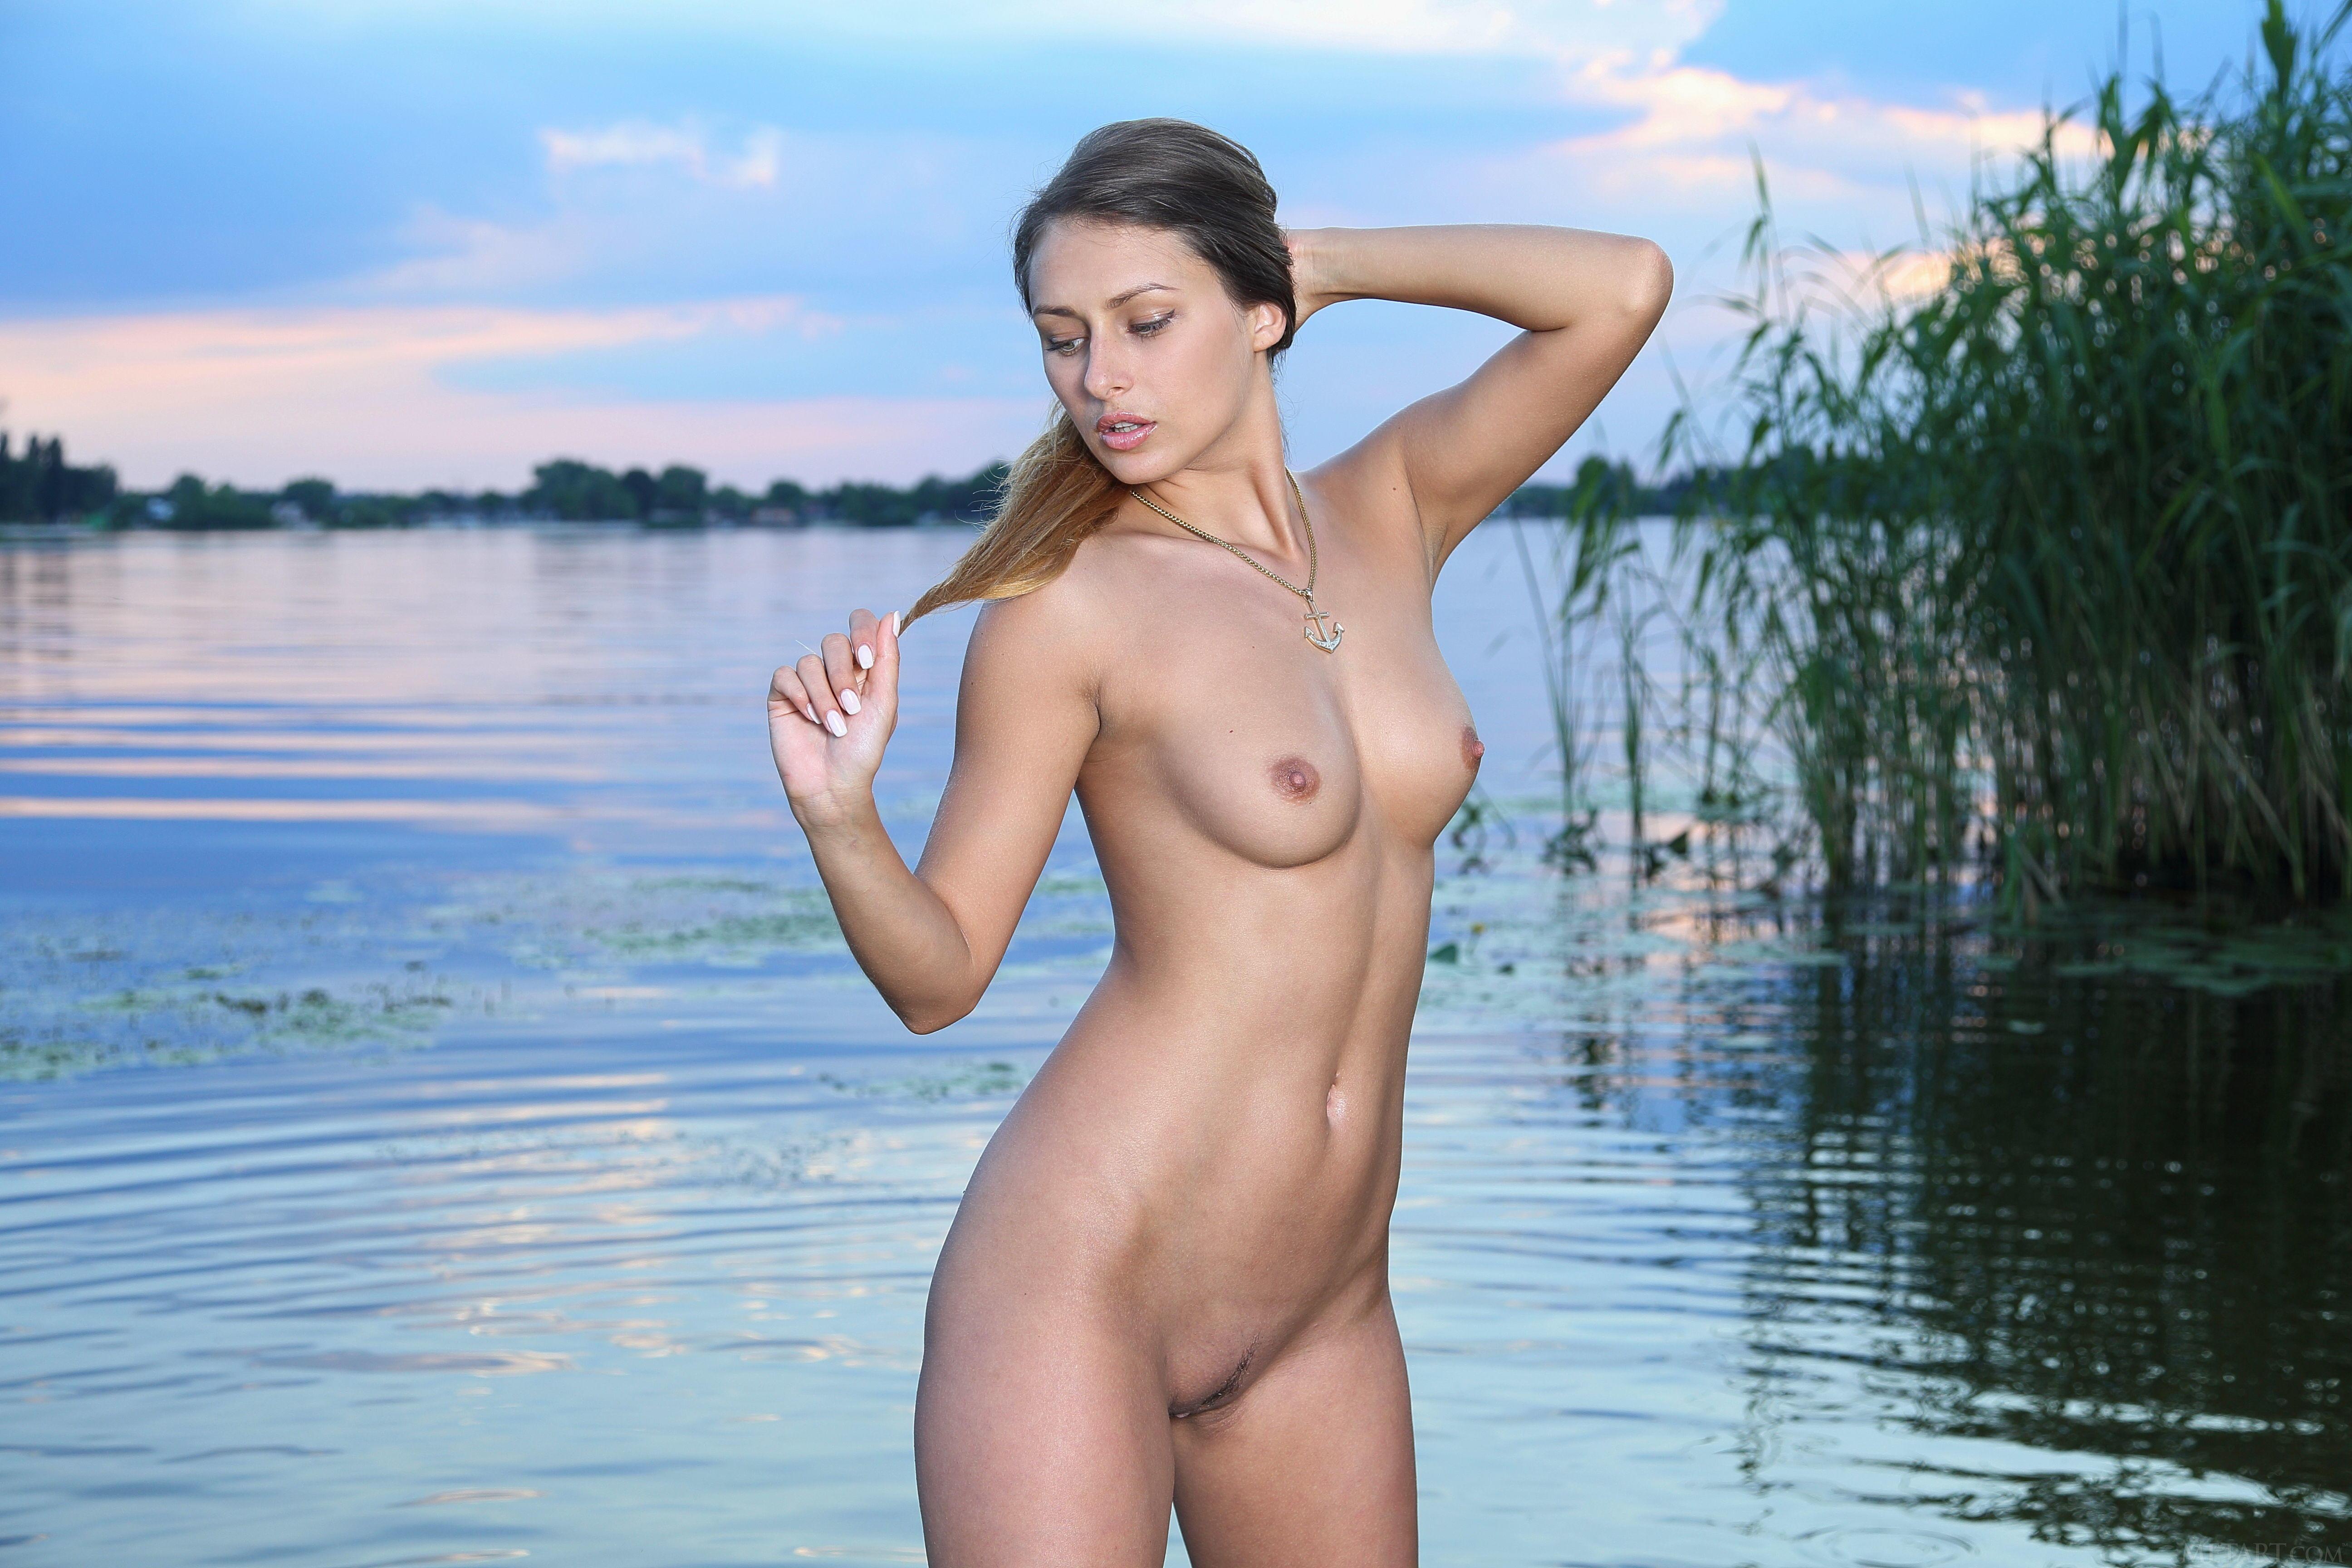 nude-girls-lake-sexy-nude-skin-babes